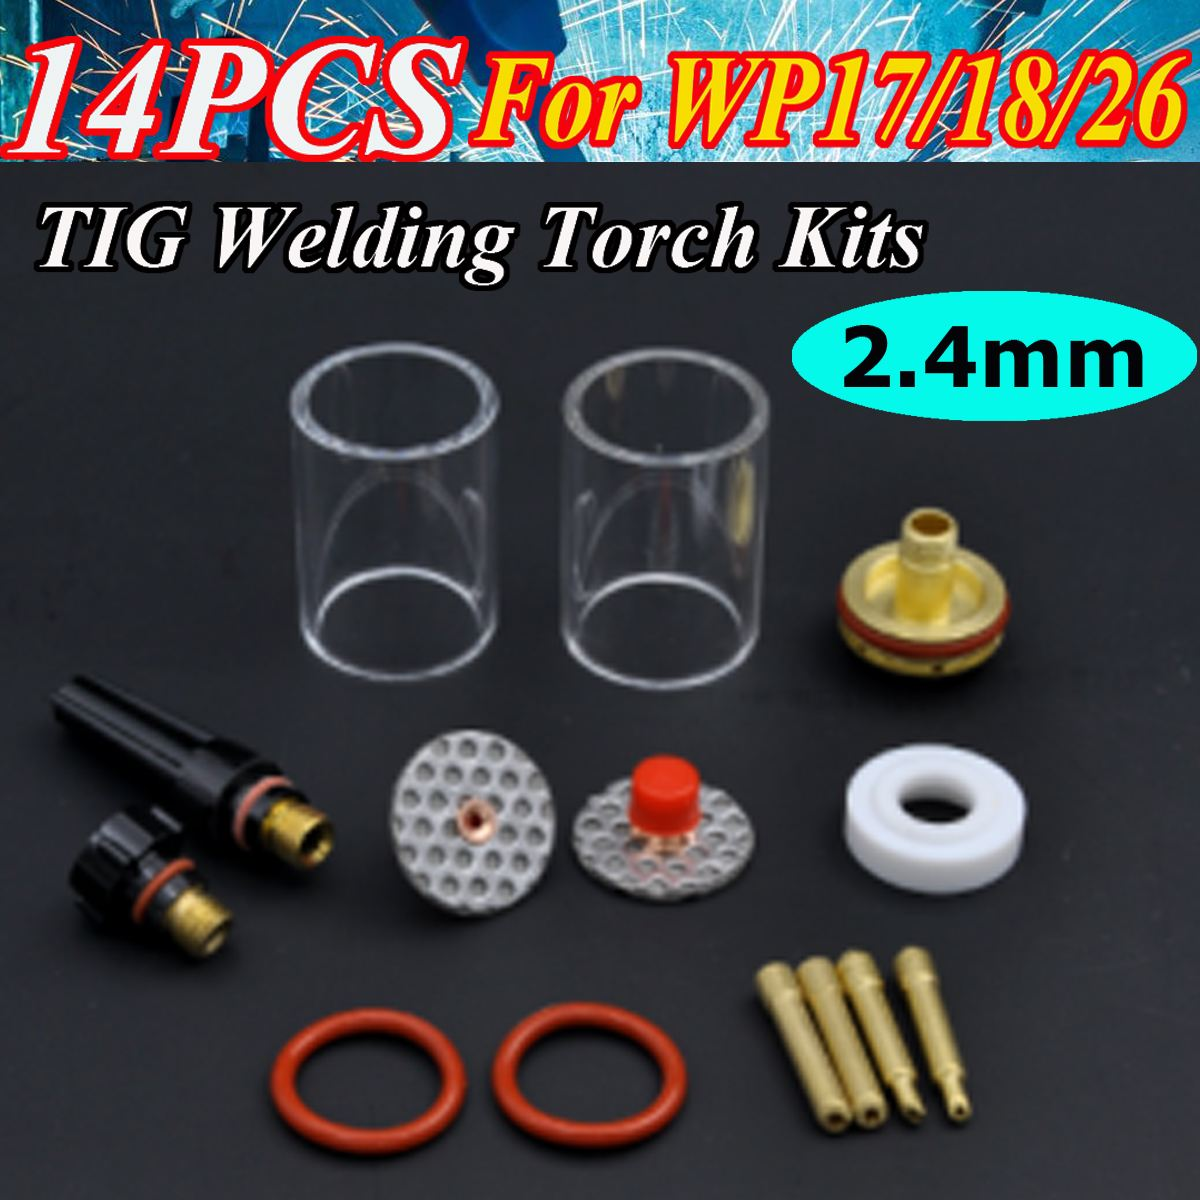 14Pcs TIG Welding Torch Stubby Gas Lens Glass Cup Kit For WP17/18/26 Series 2.4mm 3/32'' 1set 14pcs tig welding torch stubby gas lens glass pyrex cup kit 3 2mm 1 8 for wp17 18 26 welding series